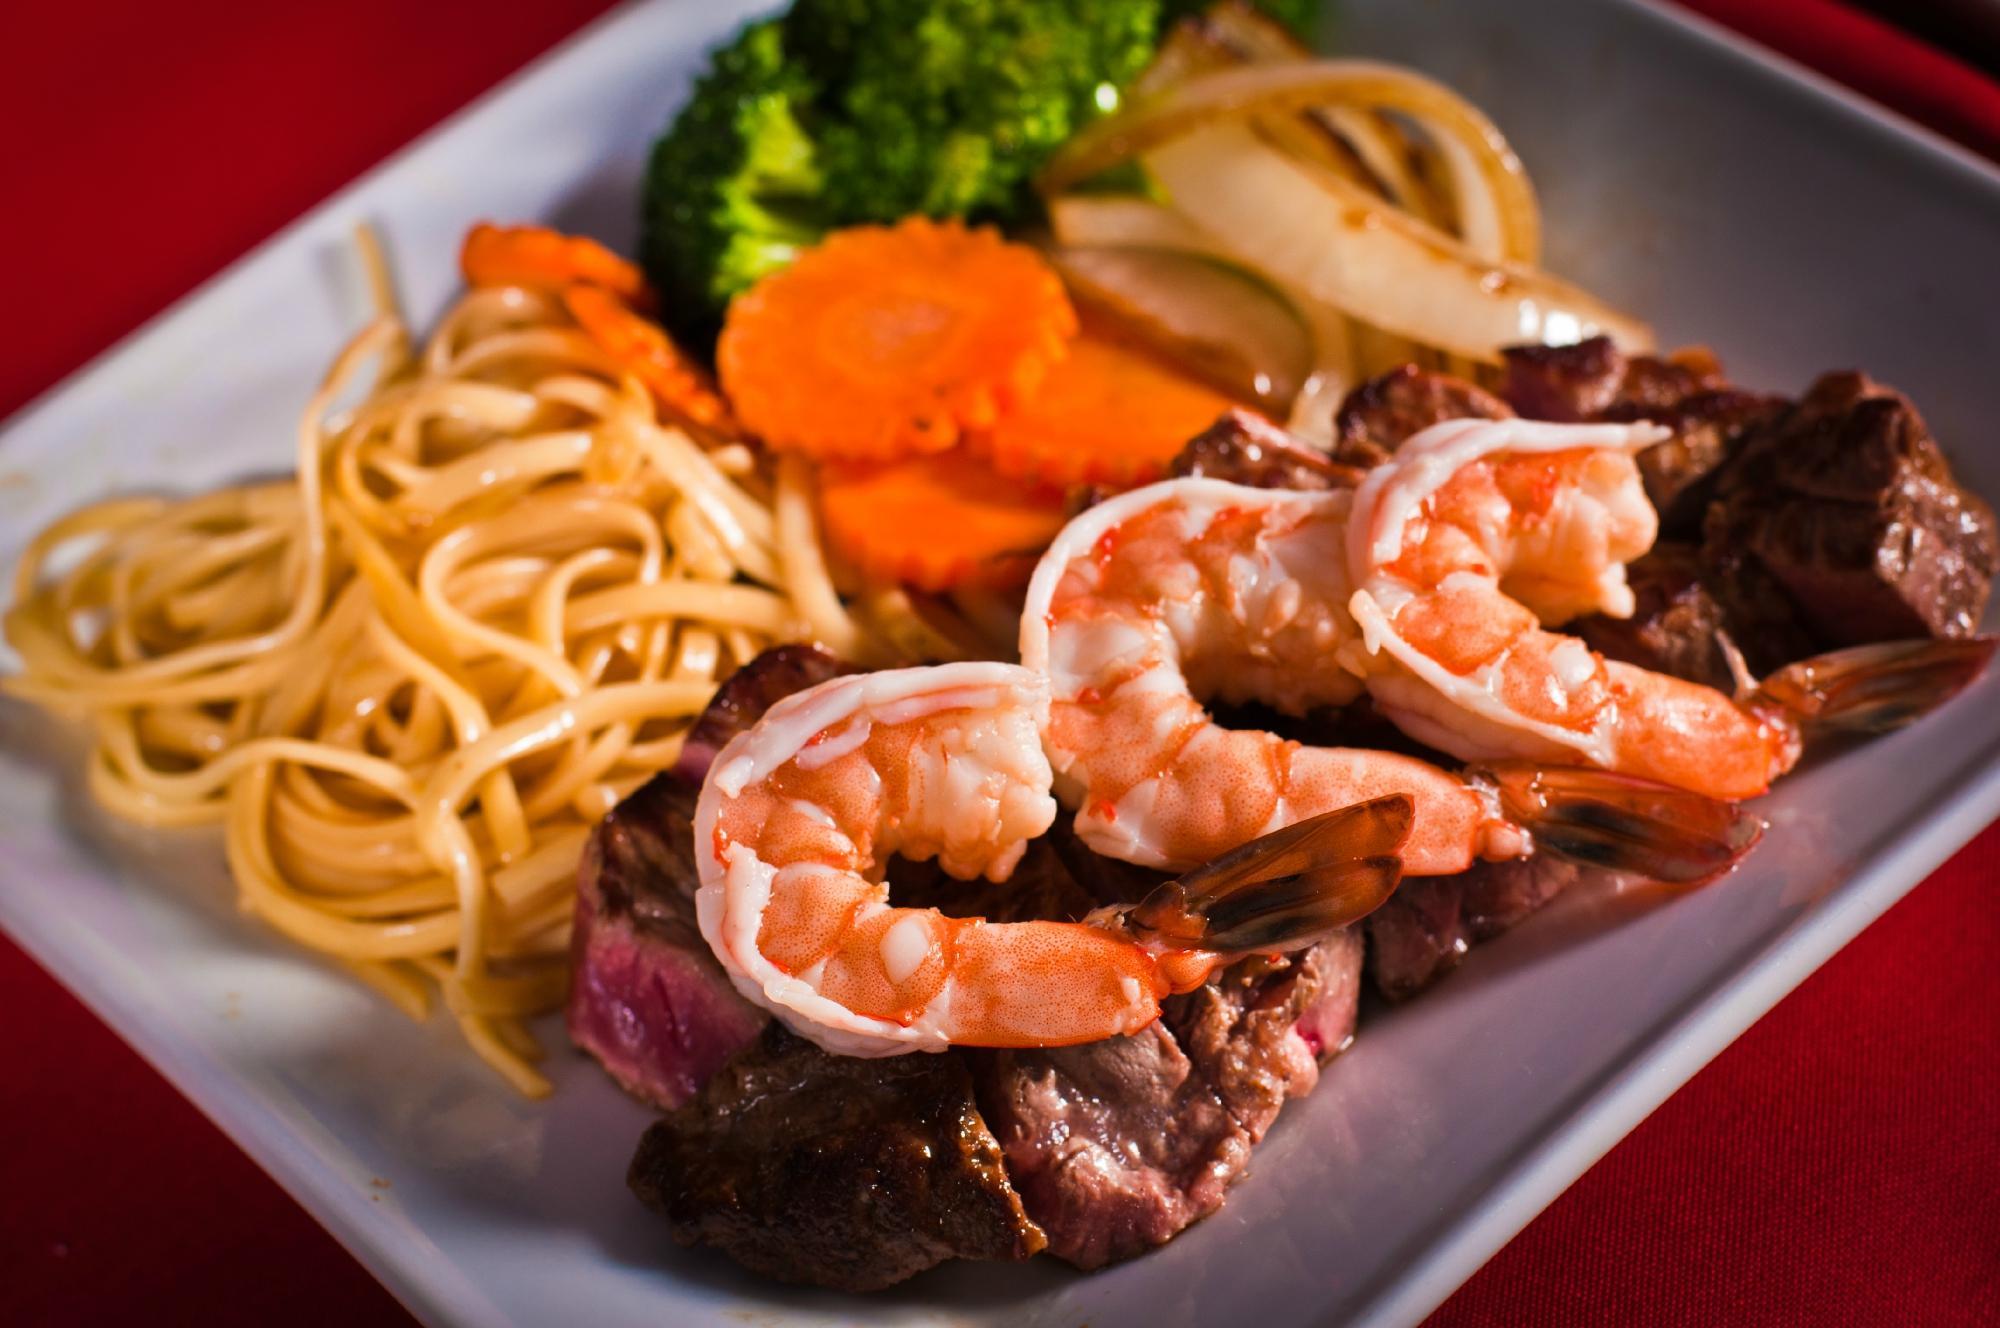 Florida, United States Food Guide: 10 Asian food Must-Eat Restaurants & Street Food Stalls in Celebration